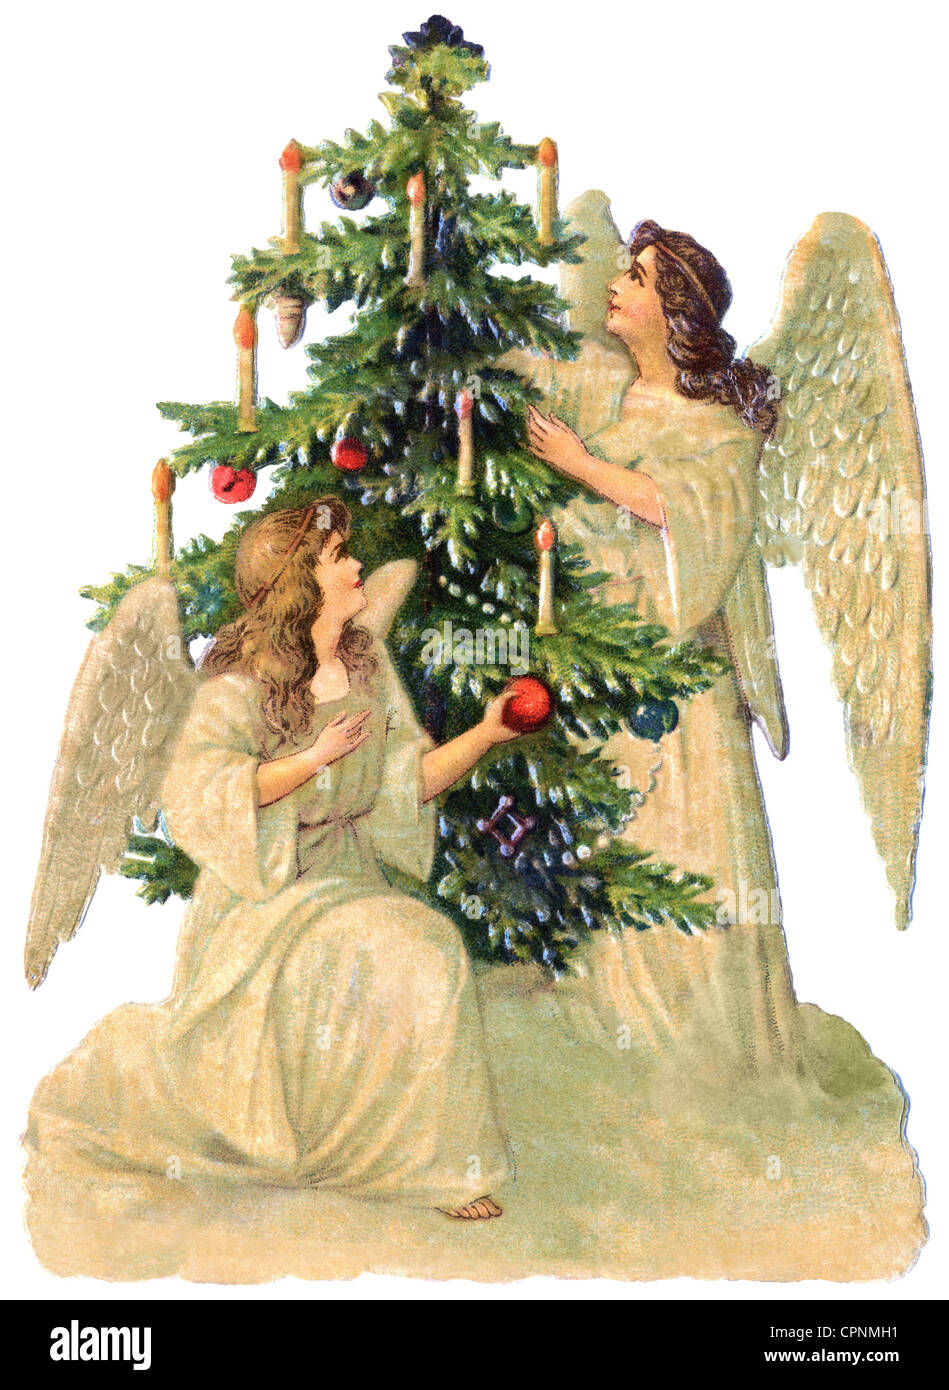 Christmas Christmas Angel Two Angels Decorating The Christmas Tree